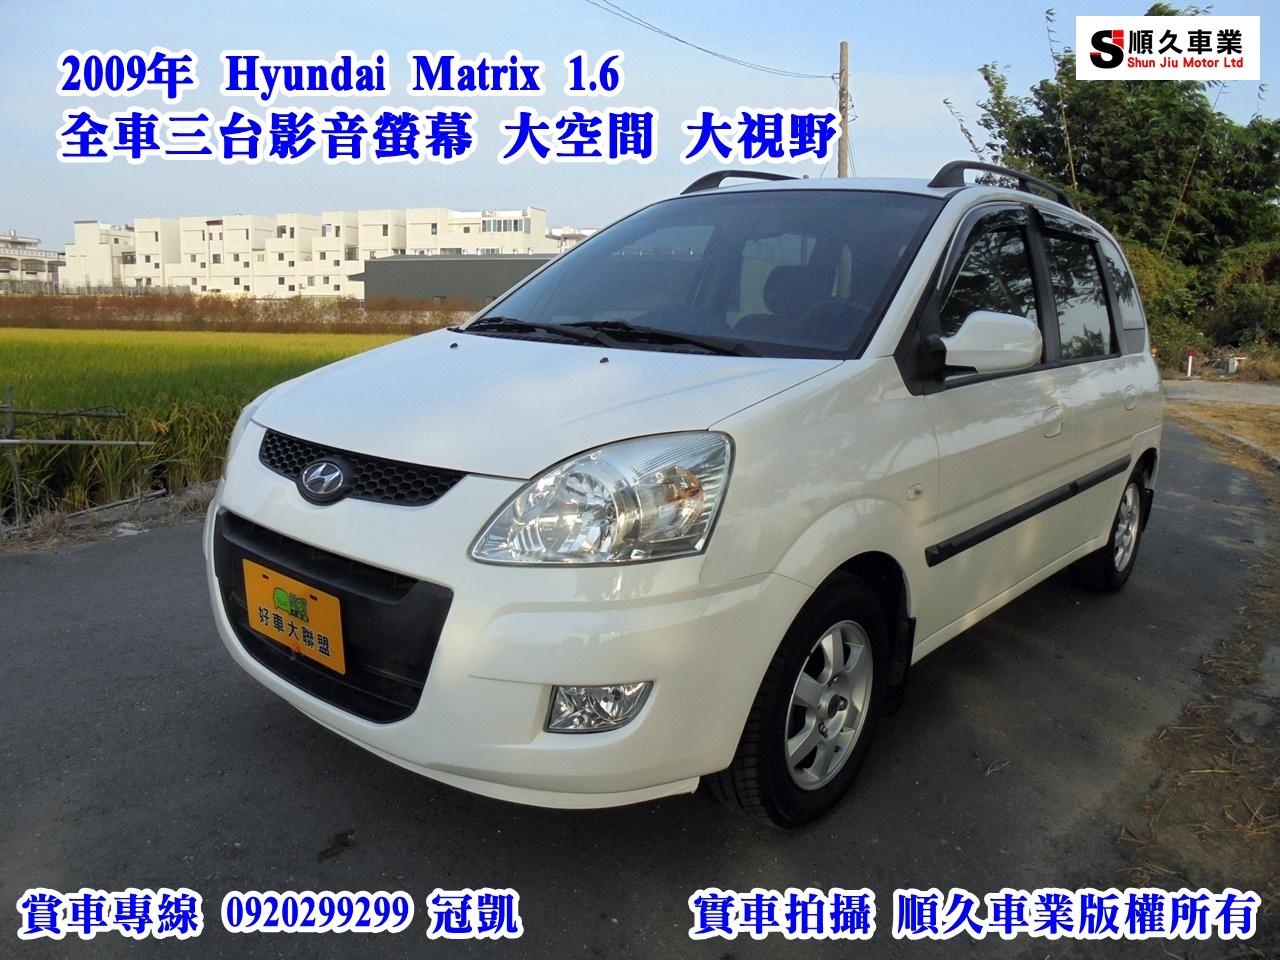 2009 Hyundai Matrix